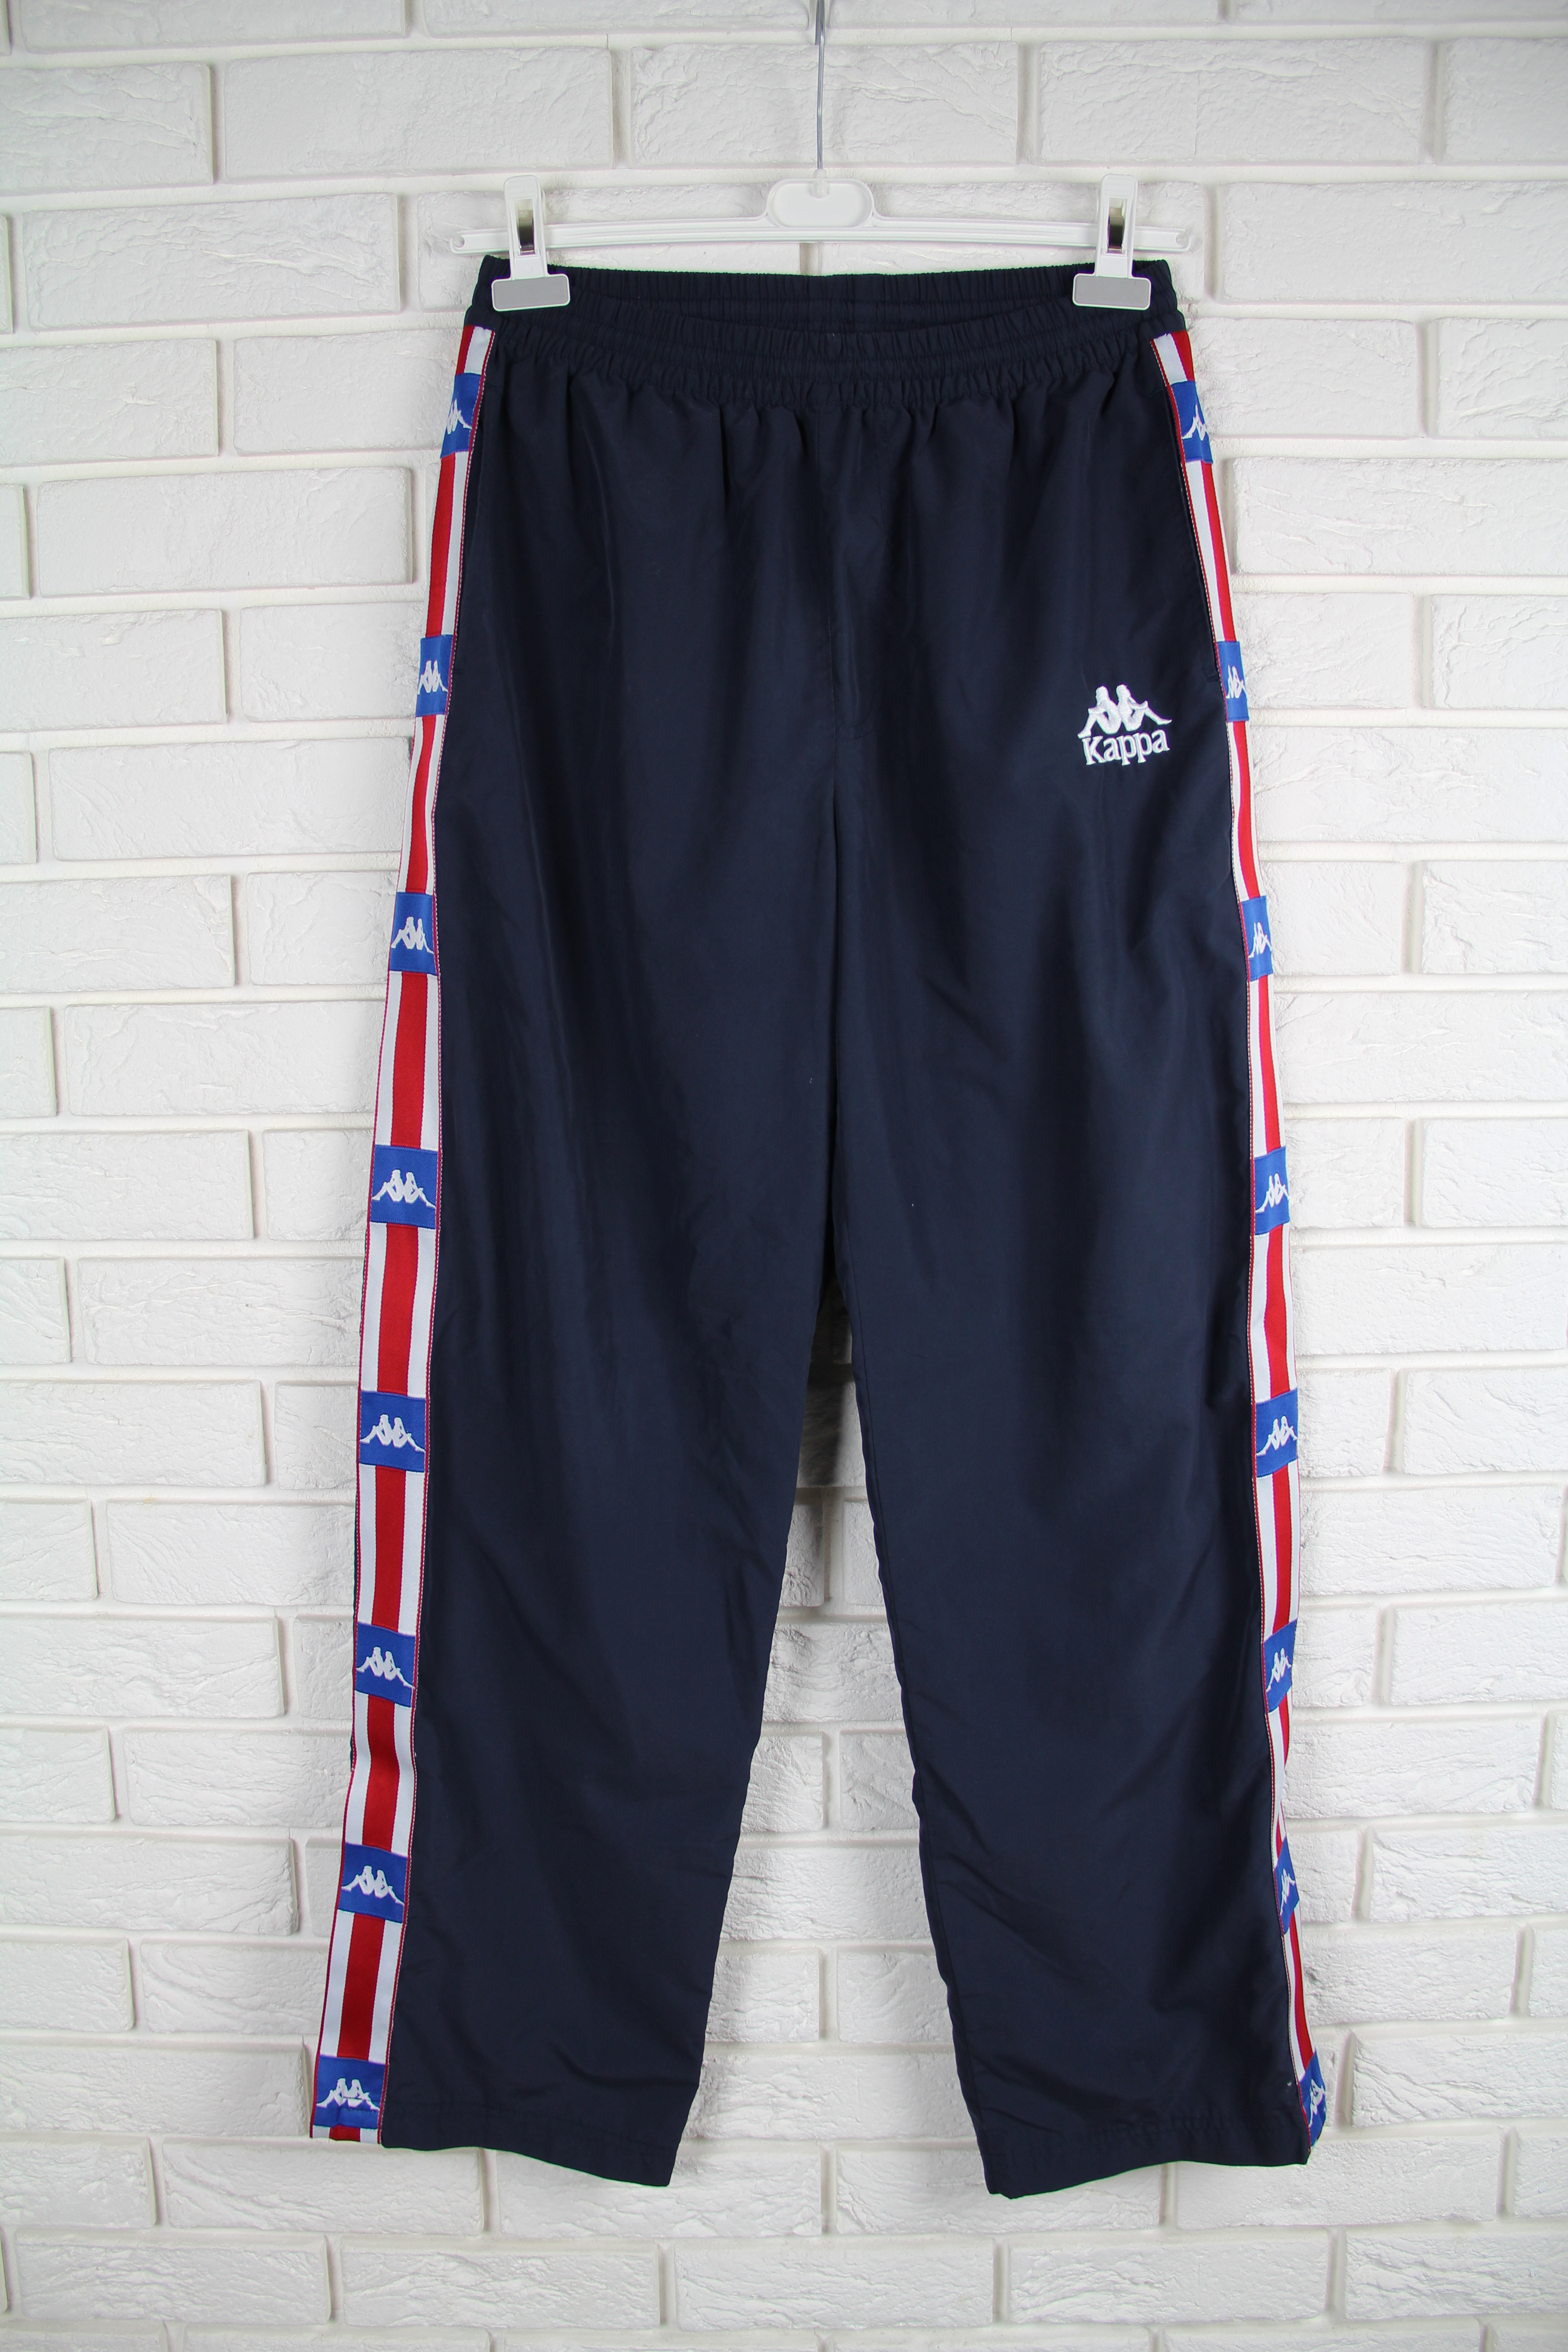 5988ce9183 Steal!Kappa USA Track Pants